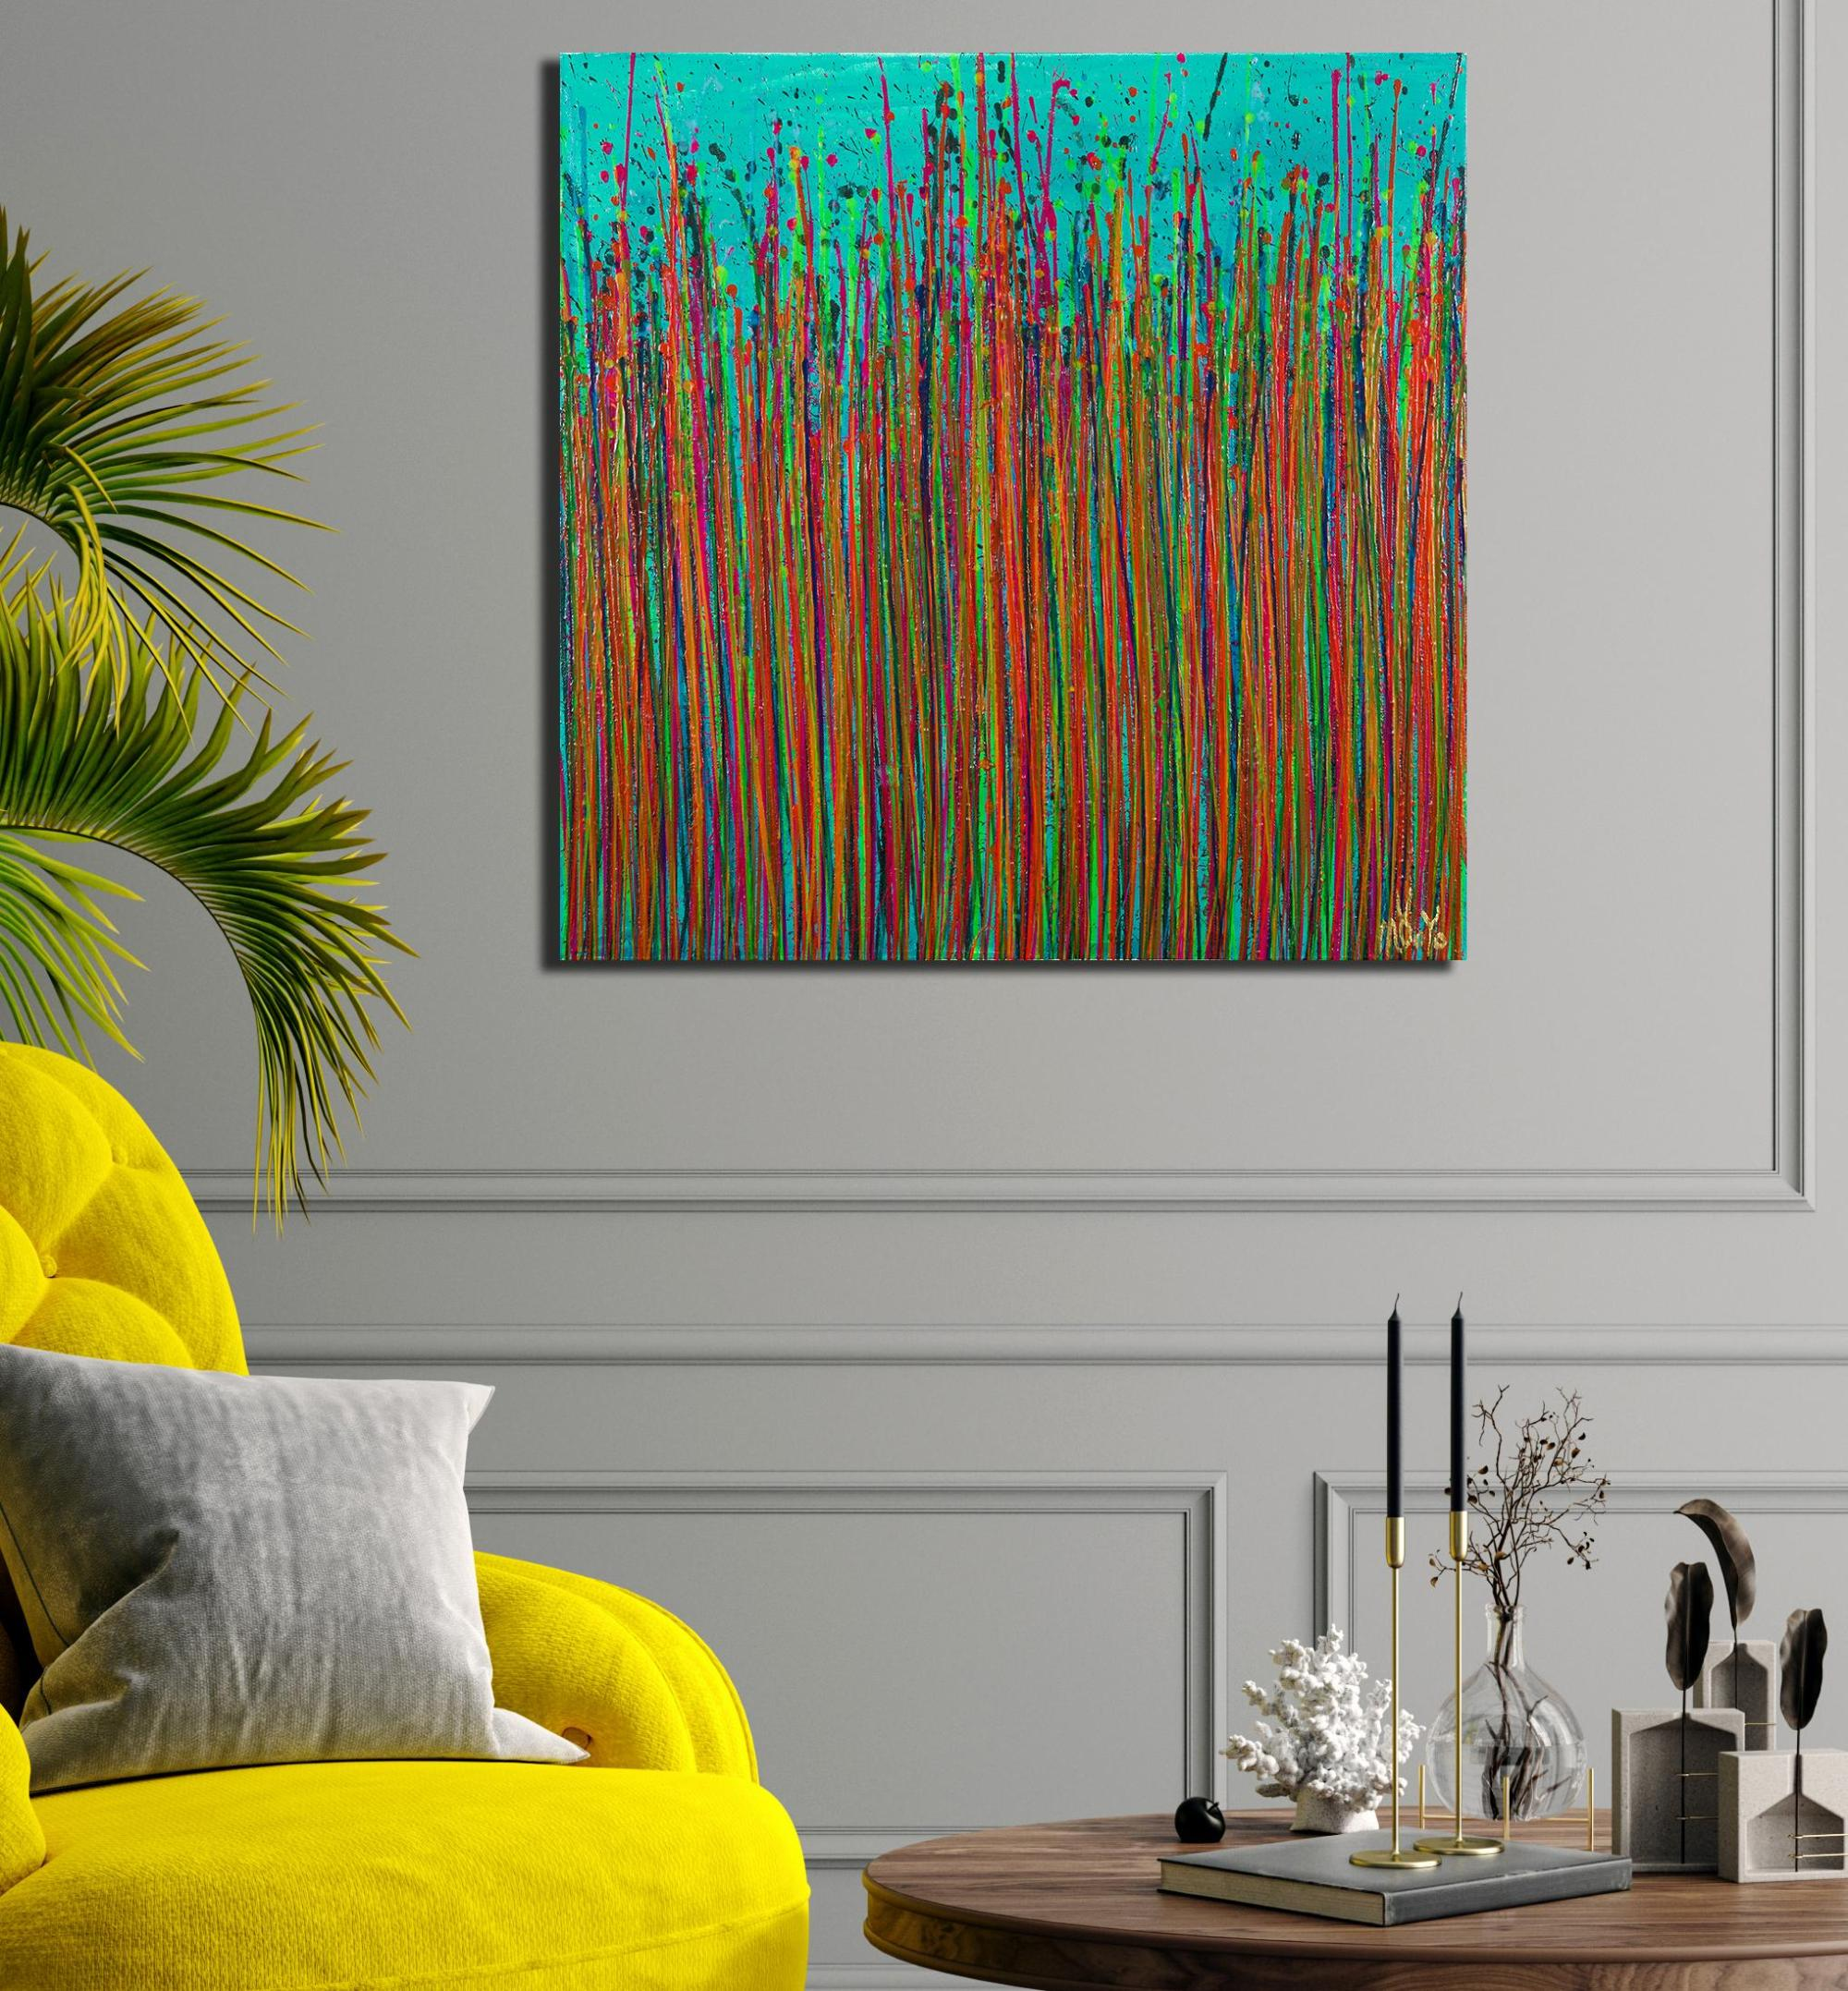 Room example / Caribbean Reflections 6 (2021) / Artist: Nestor Toro